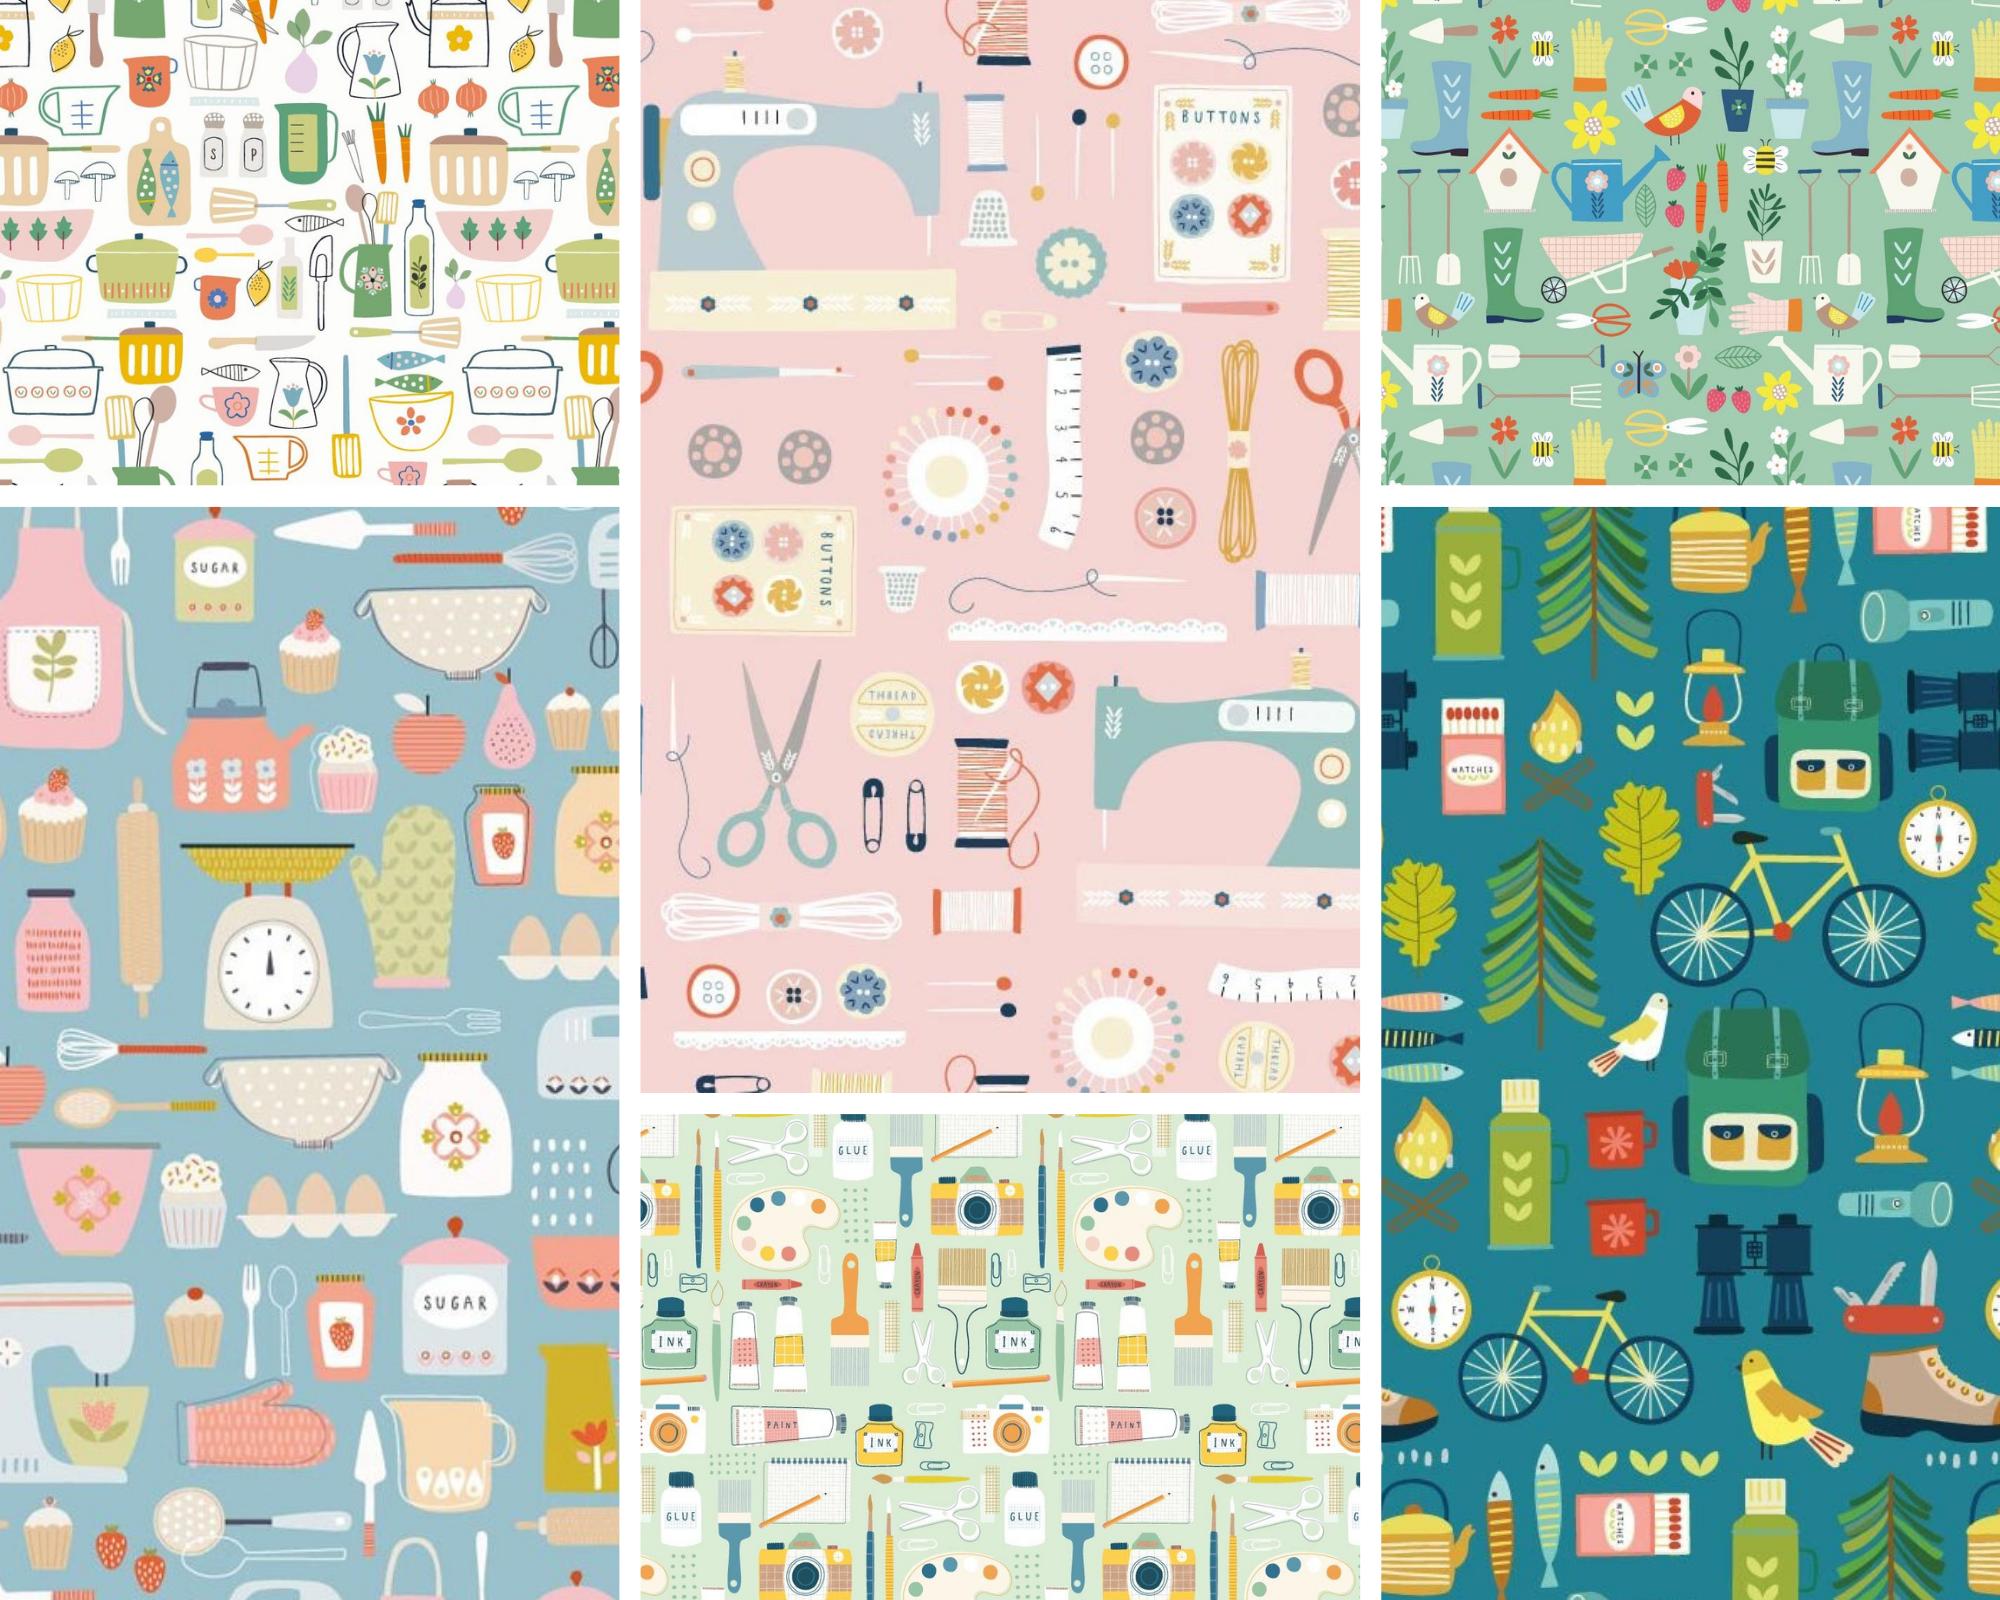 Hobbies - Fat Quarter Bundle 6pc/bundle - By Sally Payne For Dashwood Studios